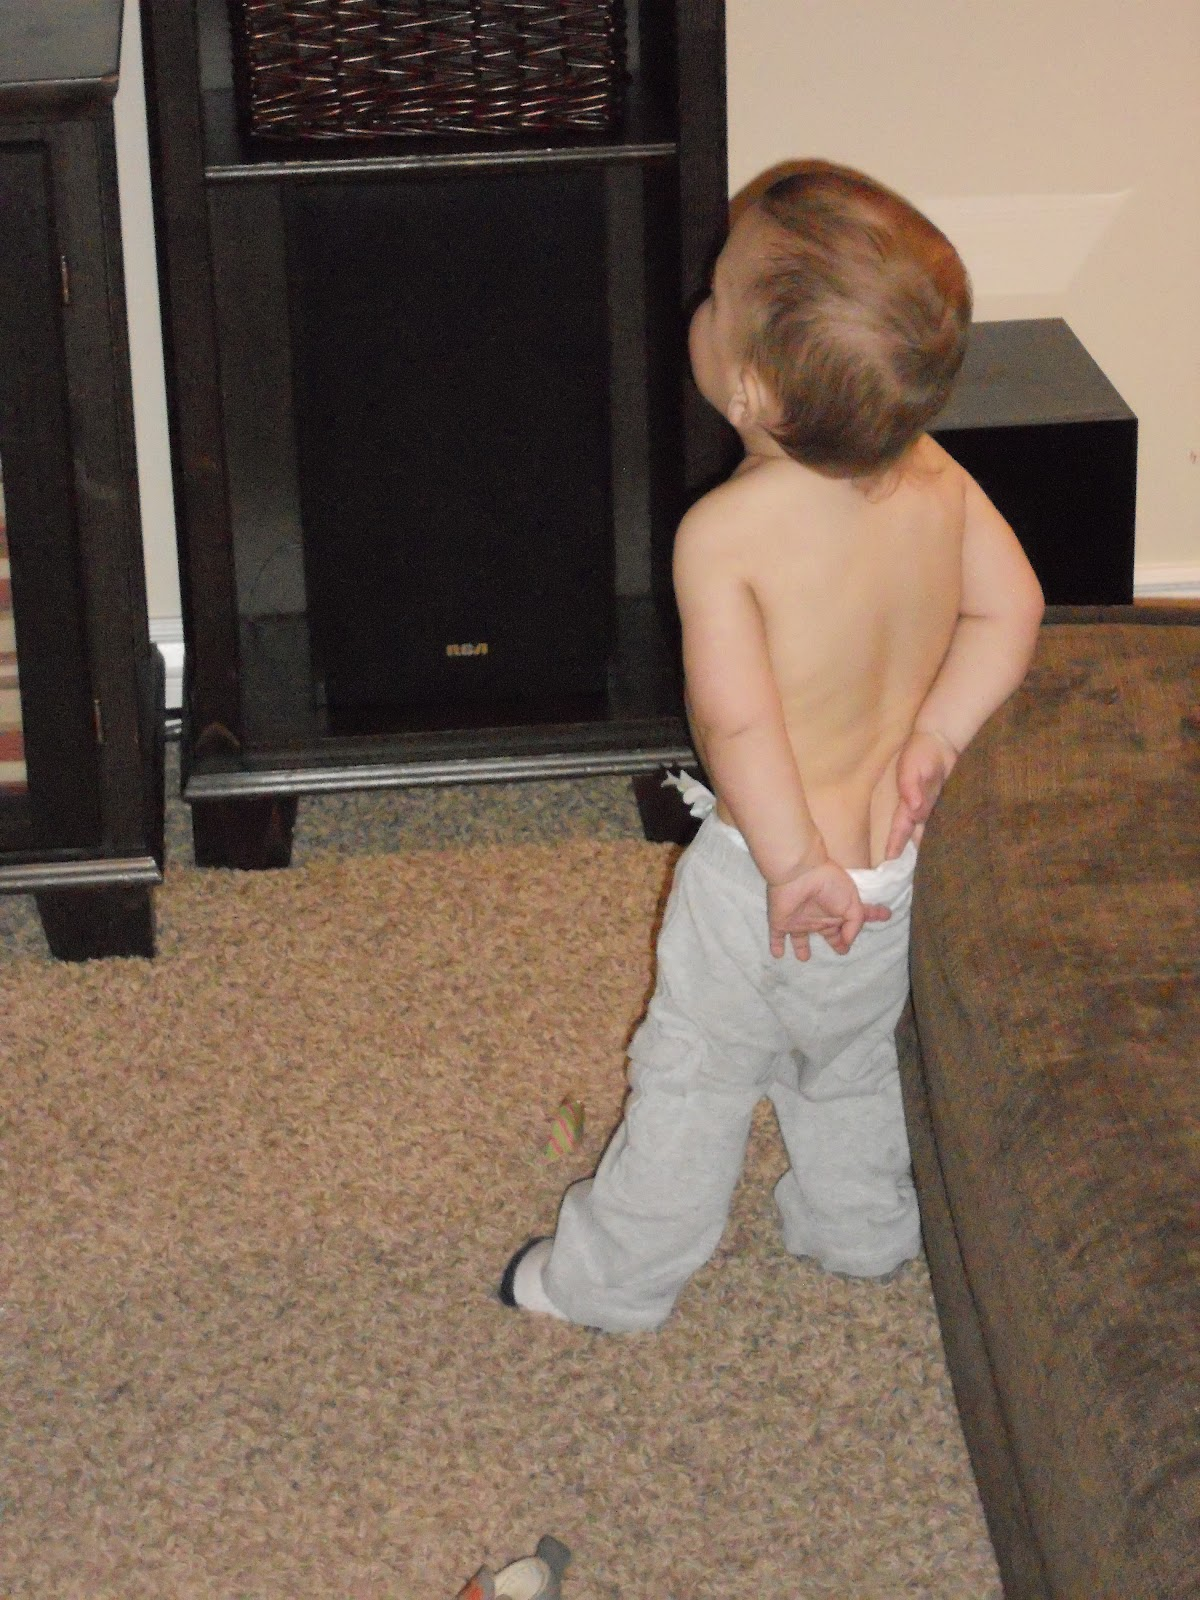 Small teenage boy buttock photo gay trace